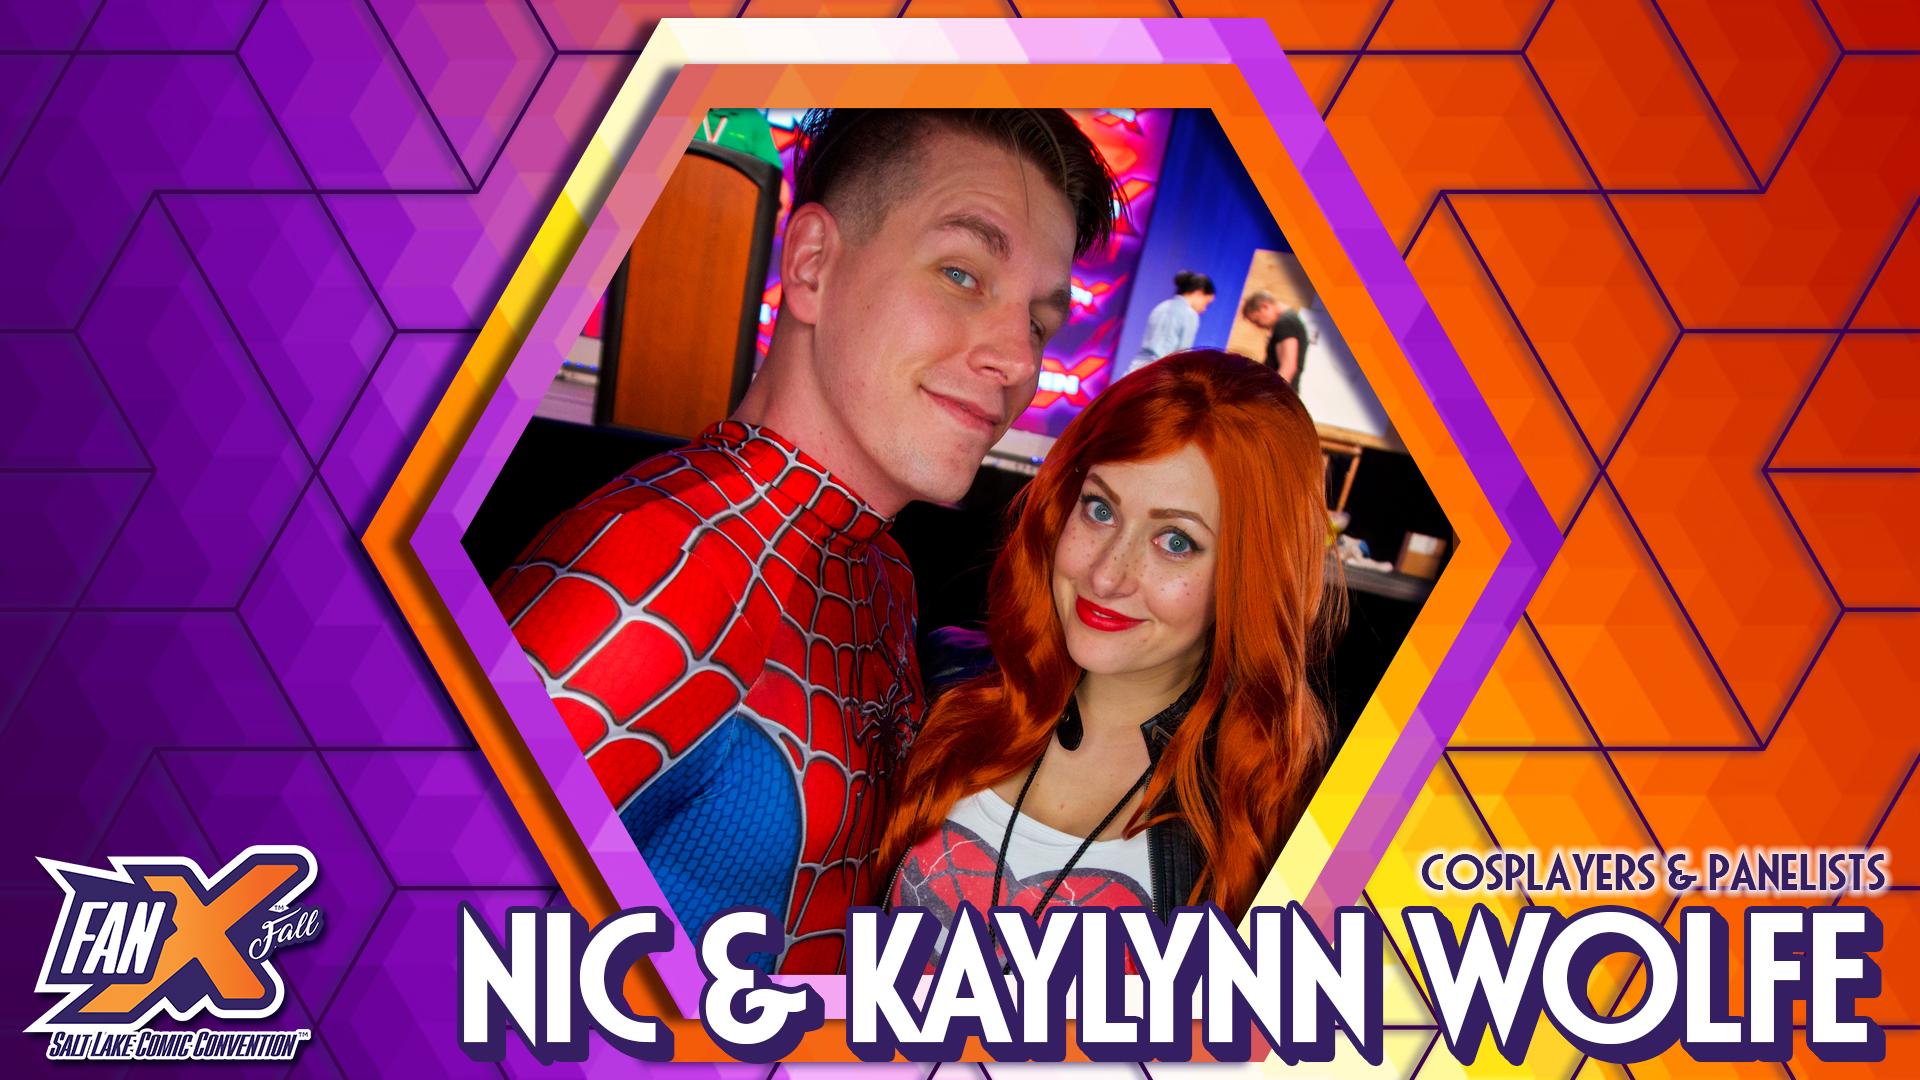 Nic Kaylynn Wolfe FanX Salt Lake Comic Convention 1920x1080